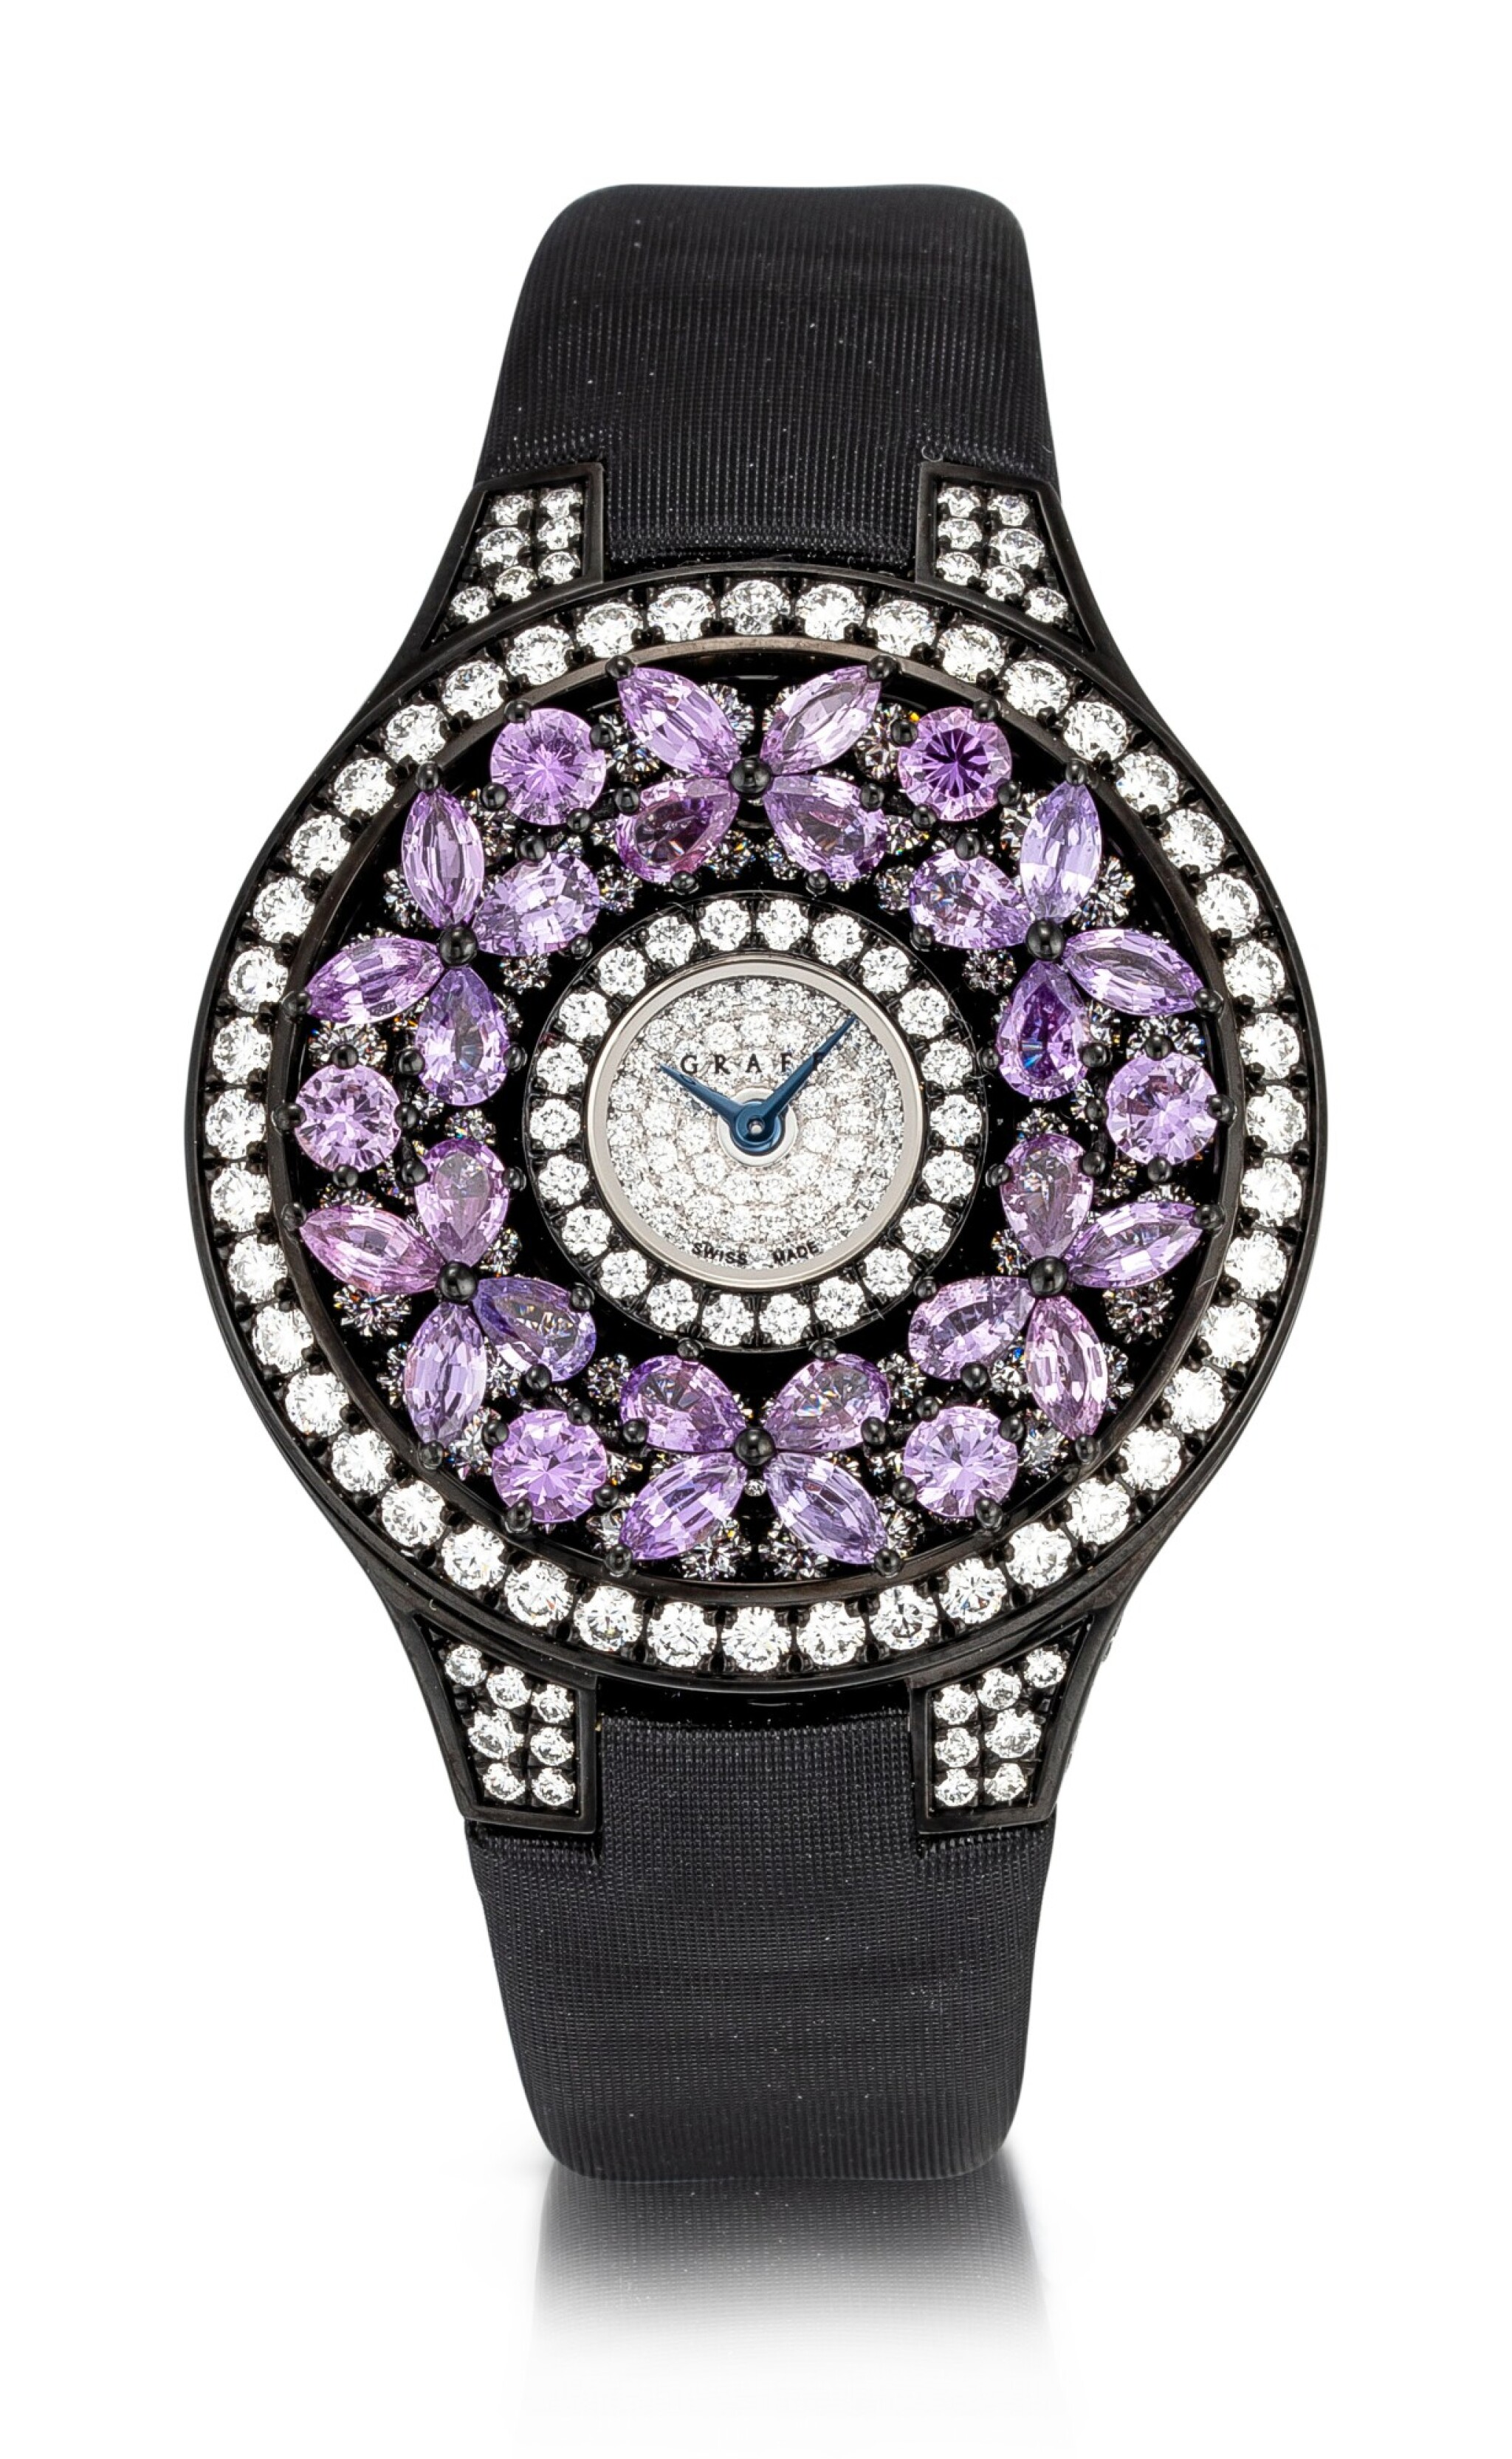 View 1 of Lot 1045. 'Butterfly' Reference BF32BGVSD, 5 Limited Edition Blackened Gold, Purple Sapphire and Diamond-Set Wristwatch | 格拉夫| Butterfly編號BF32BGVSD 5,限量版鍍黑金,紫色剛玉及鑽石腕表,約2010年製.